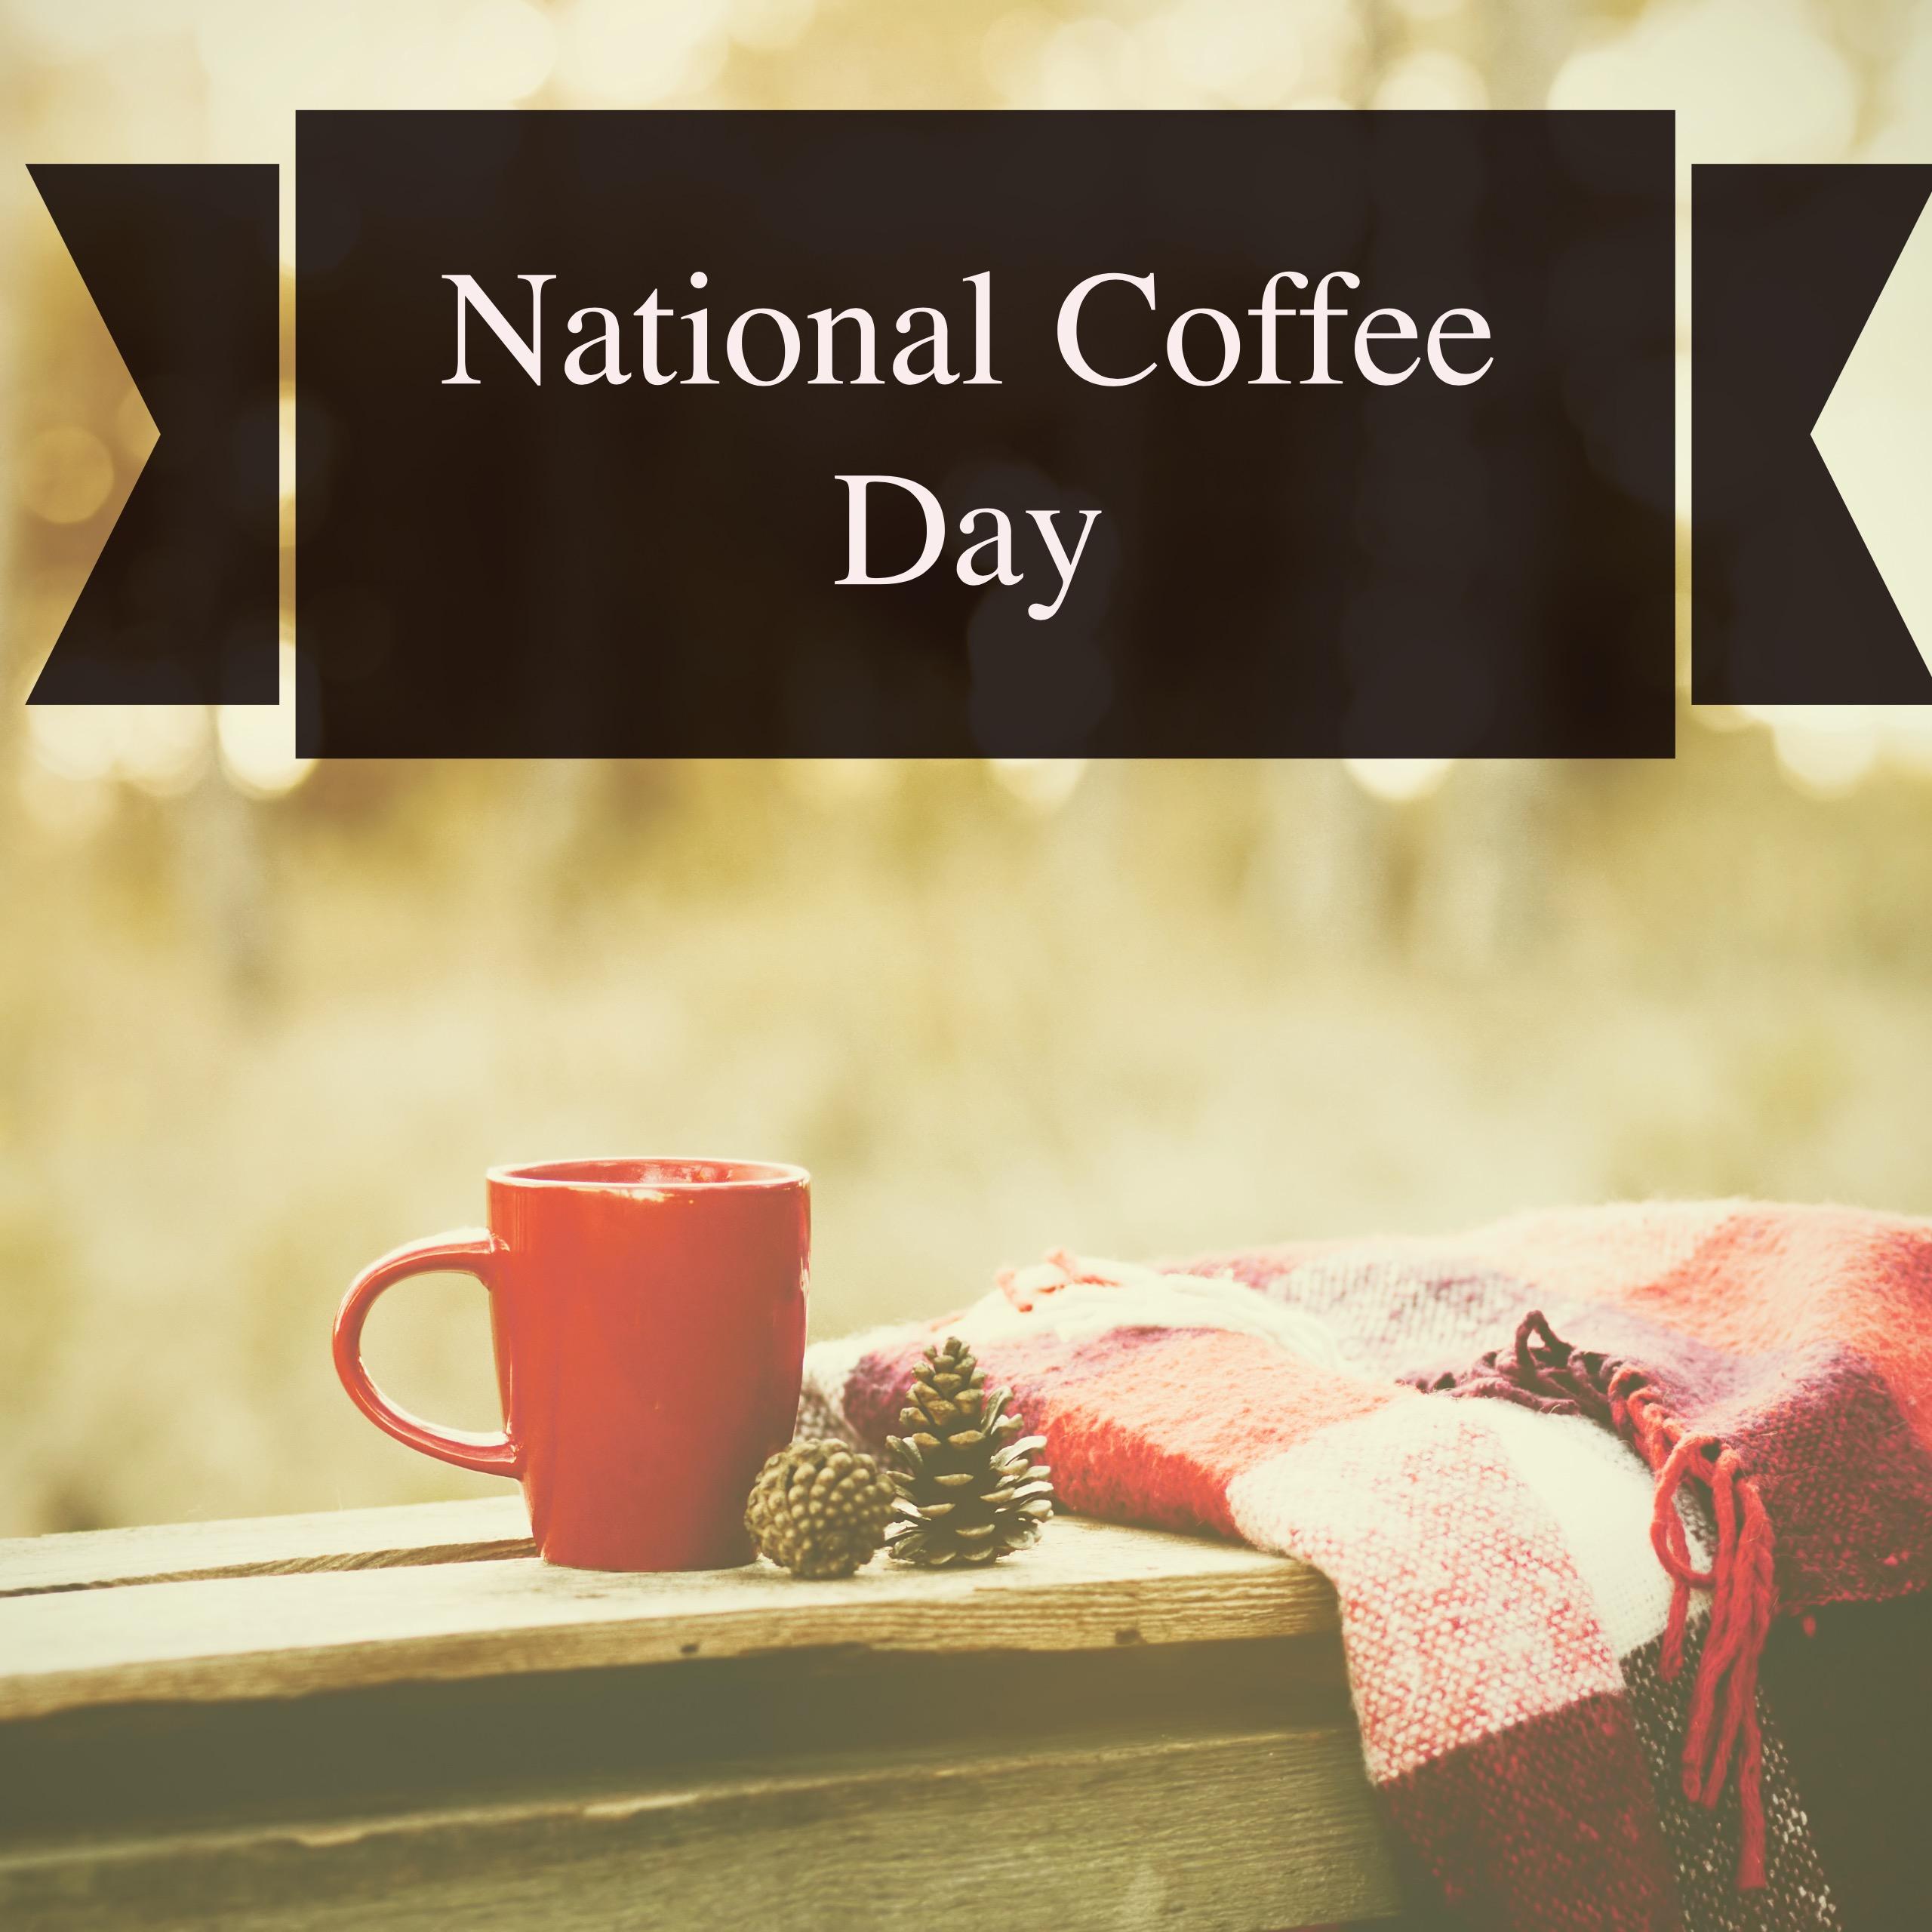 national coffee day - photo #16